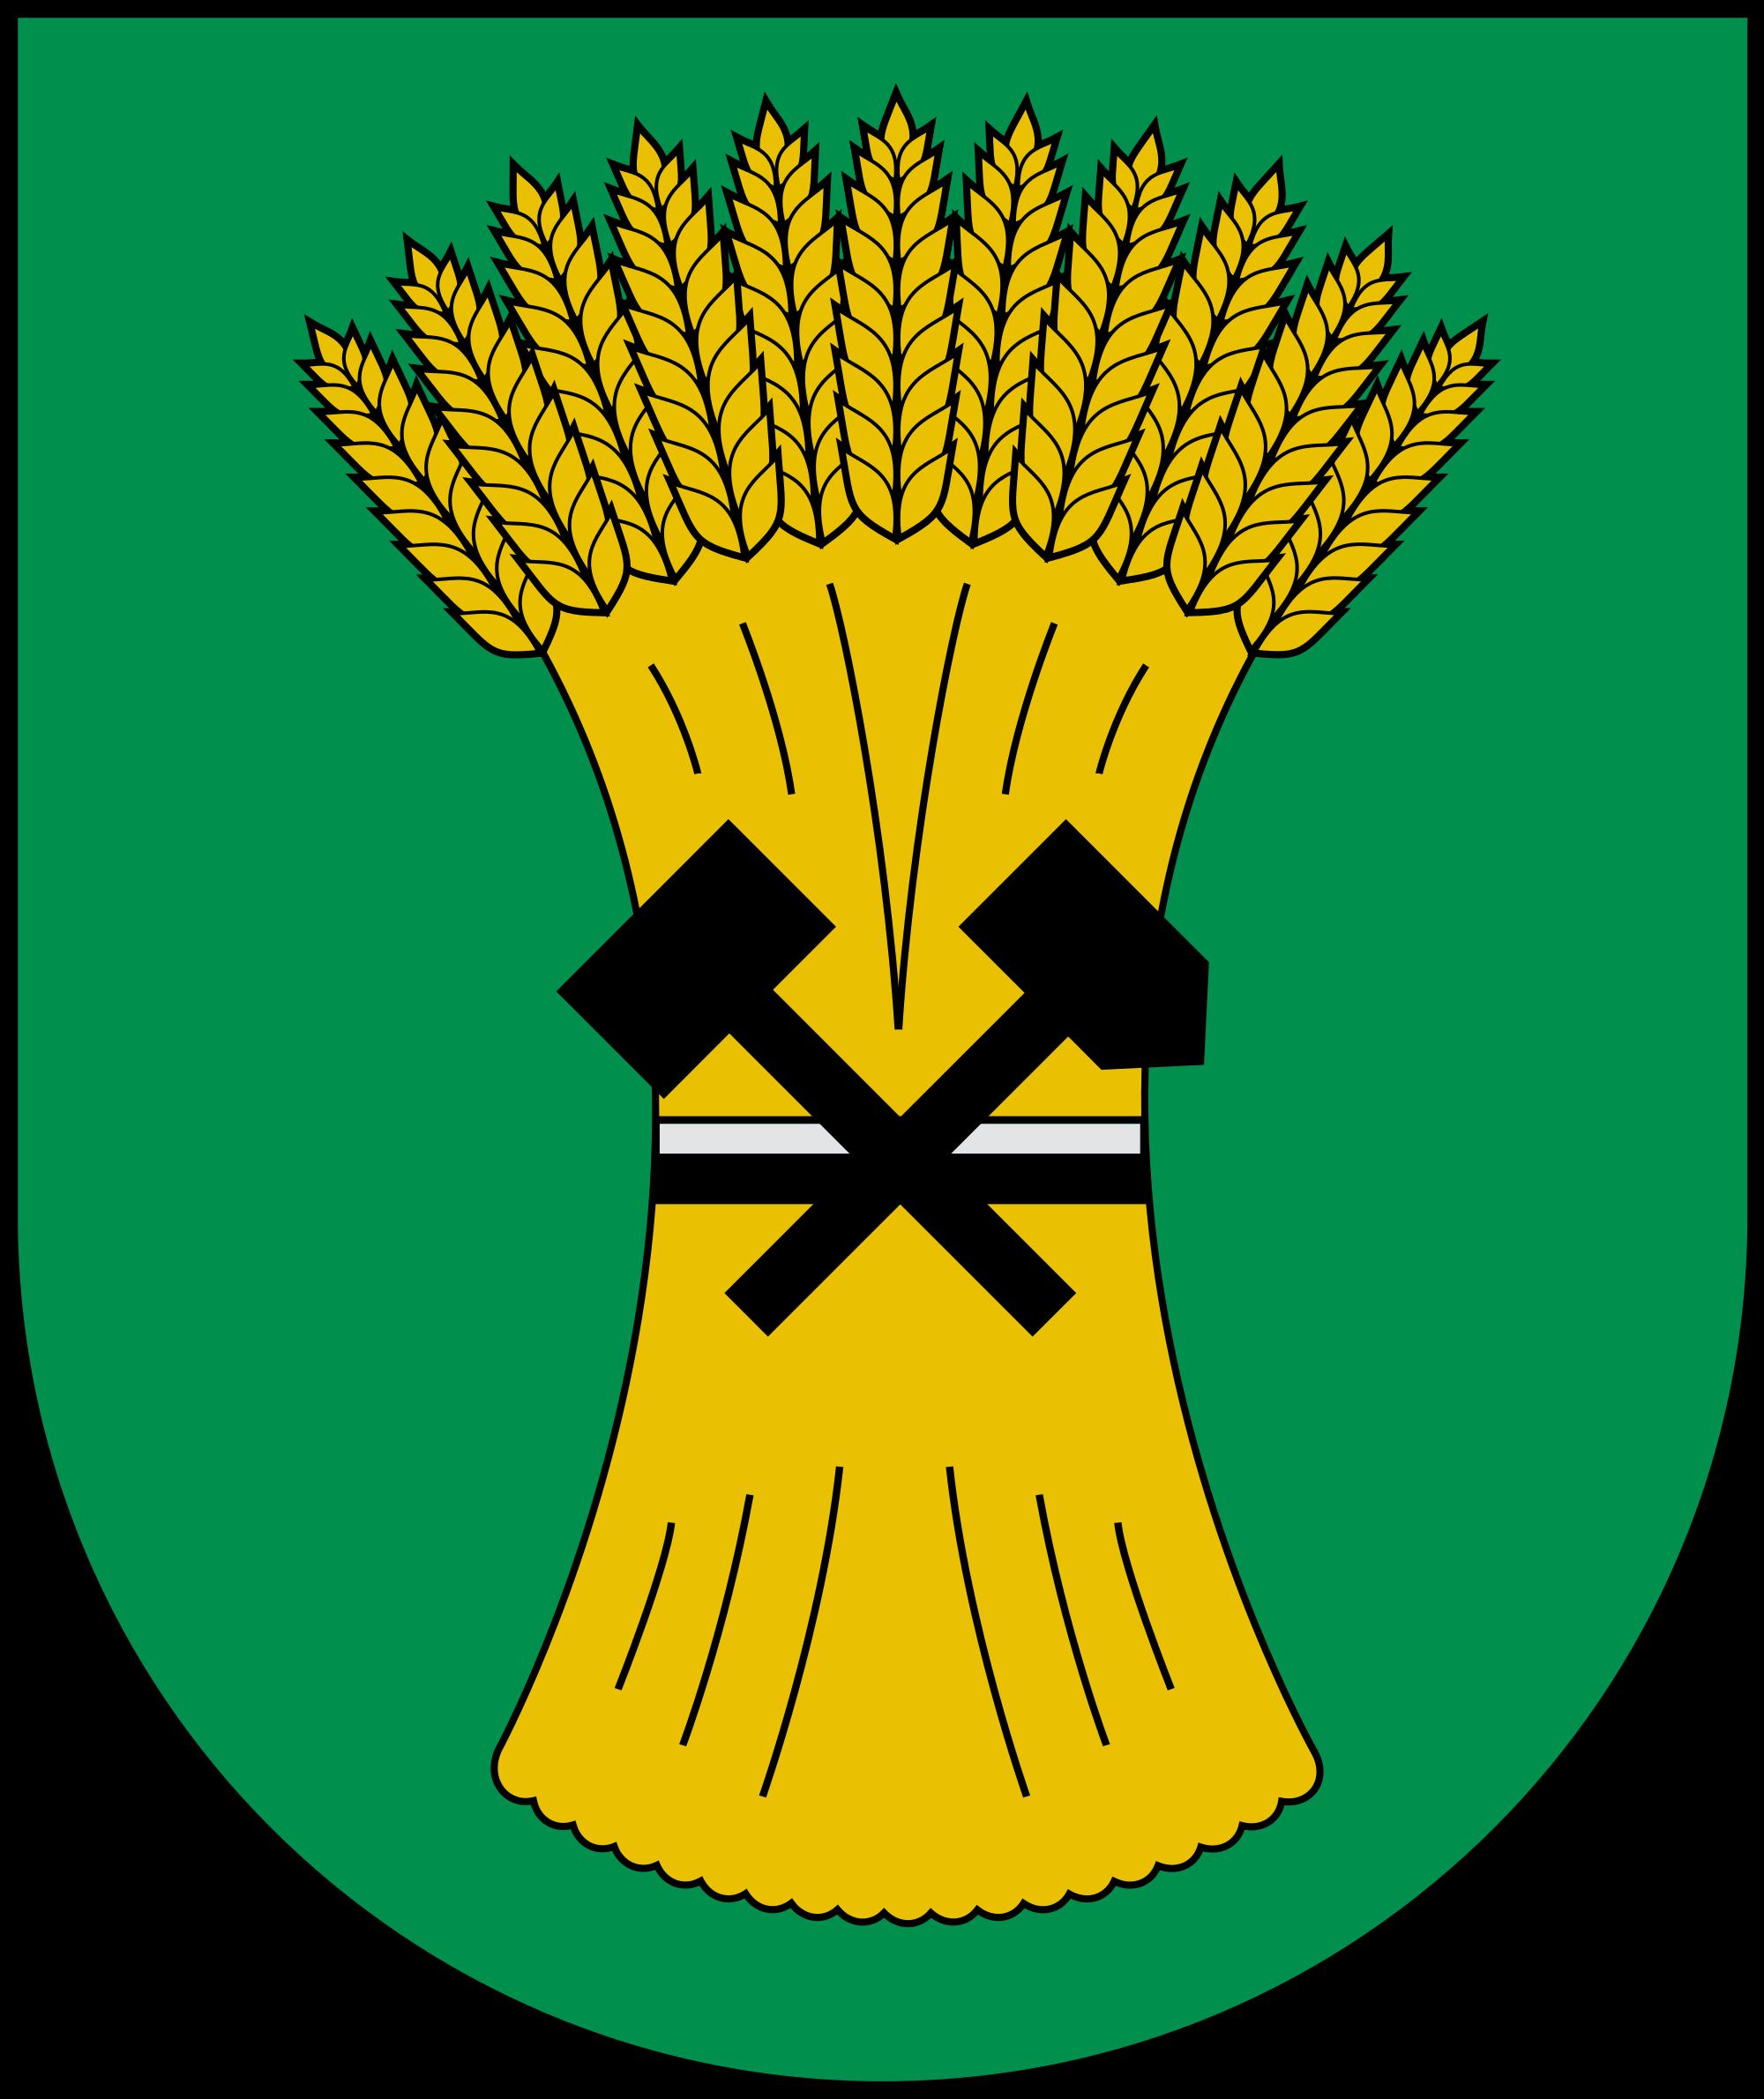 File:Wappen boehlen.svg.